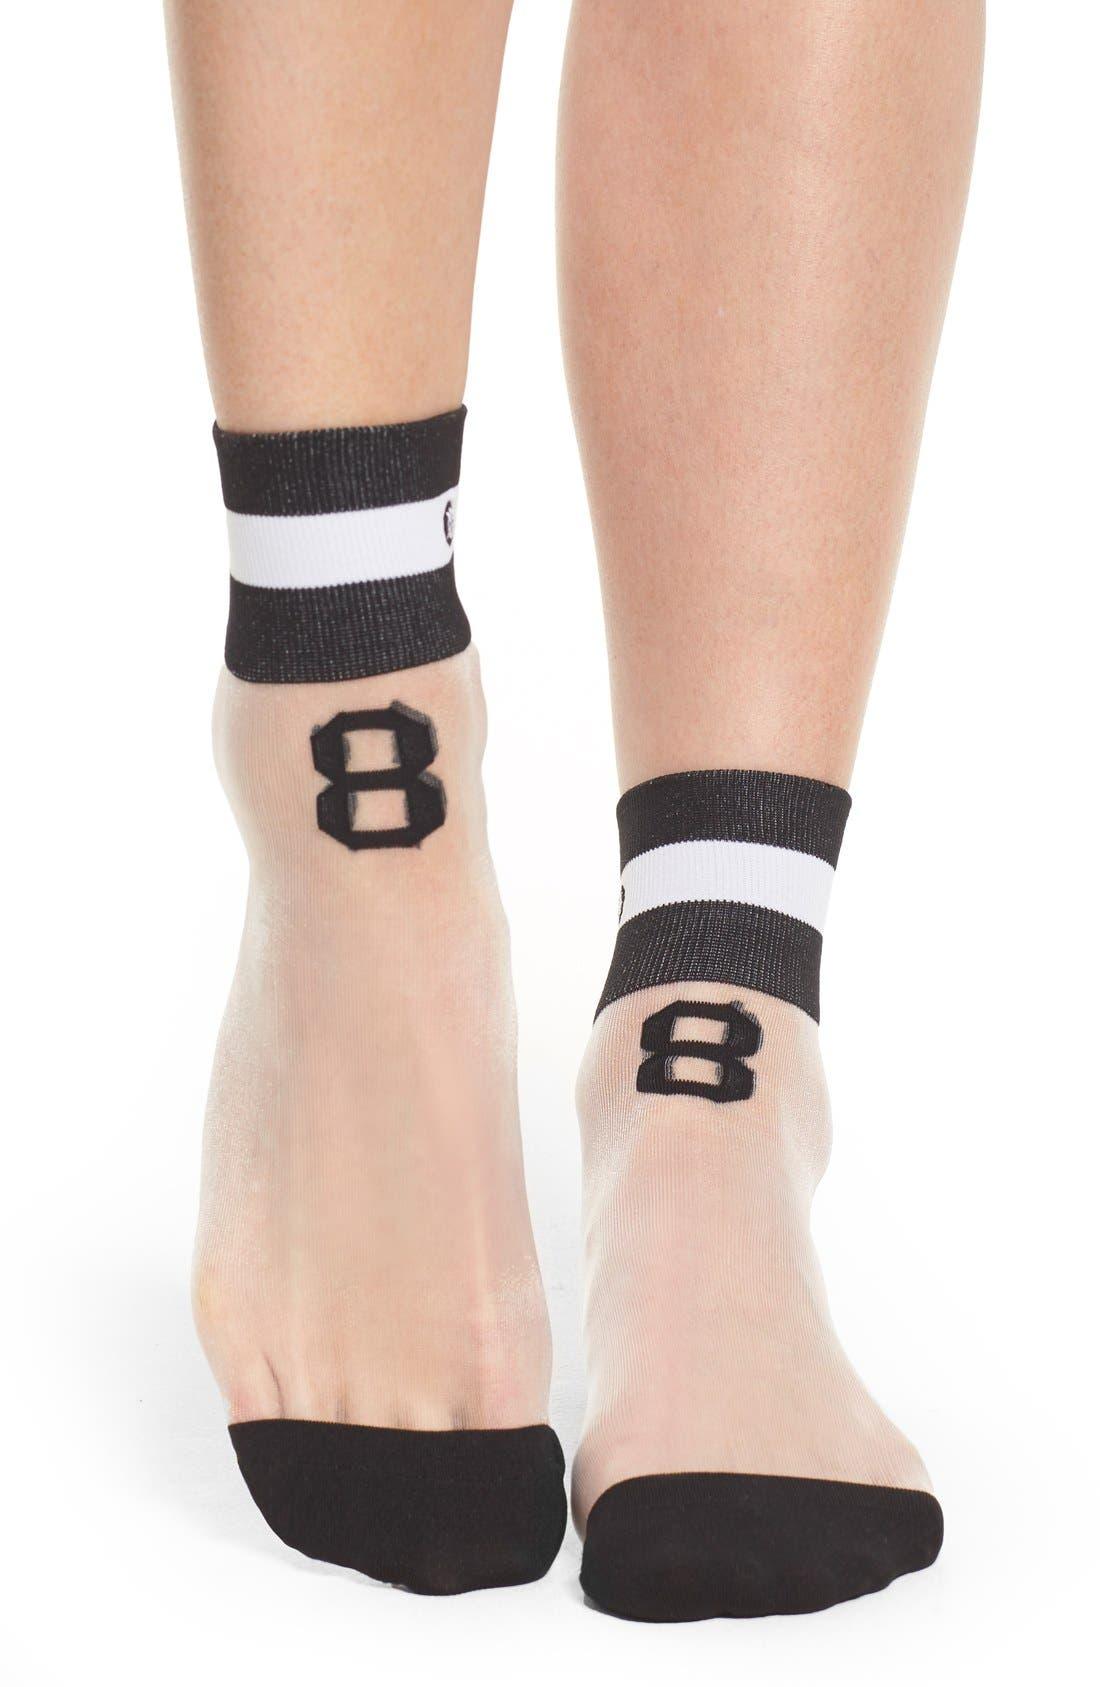 Alternate Image 1 Selected - Stance x Rihanna '88' Anklet Socks